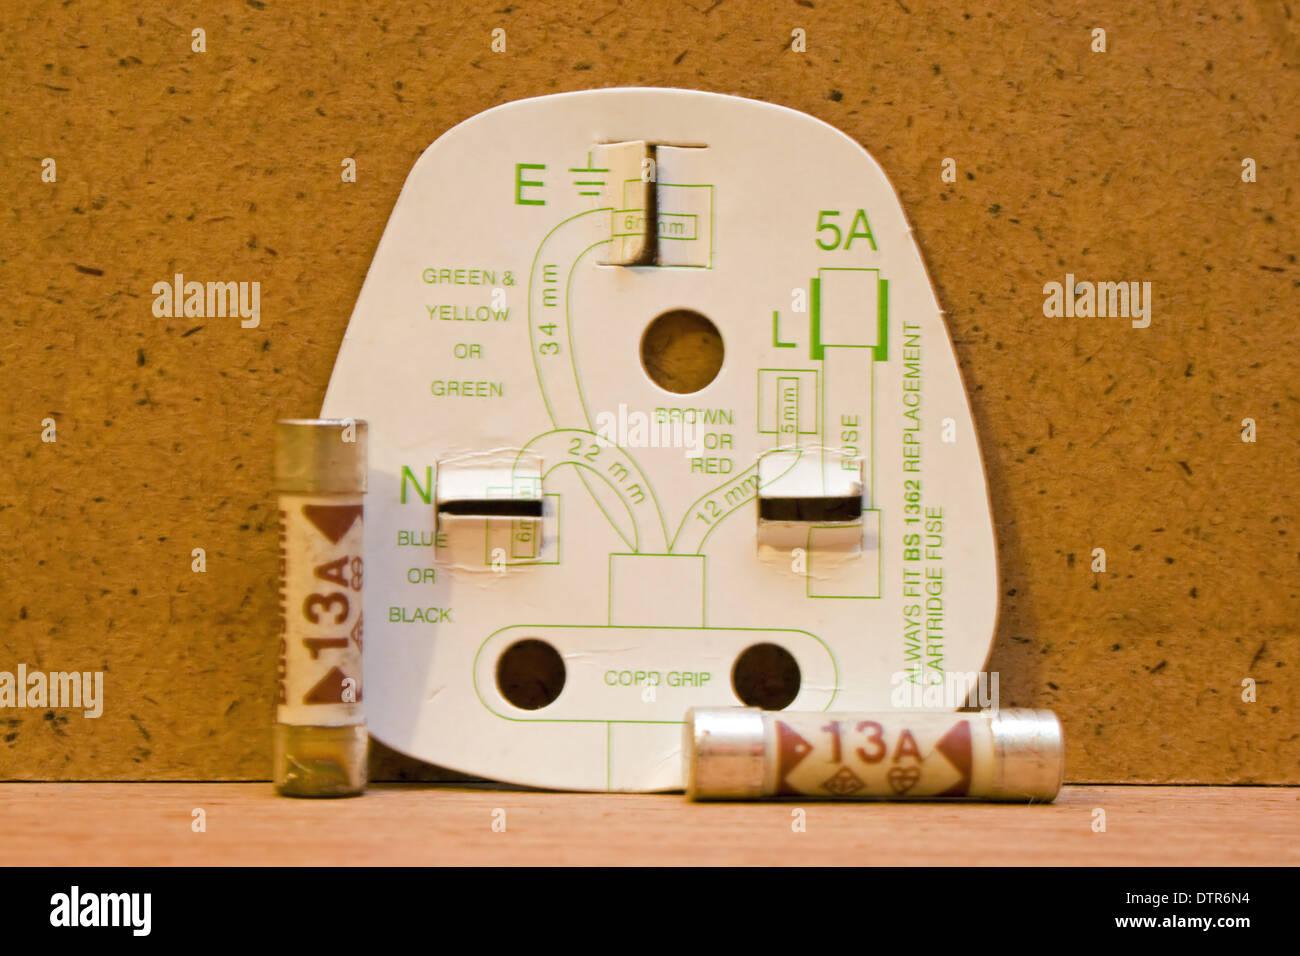 Uk Three Pin Plug Wiring Diagram With 13amp Fuses Stock